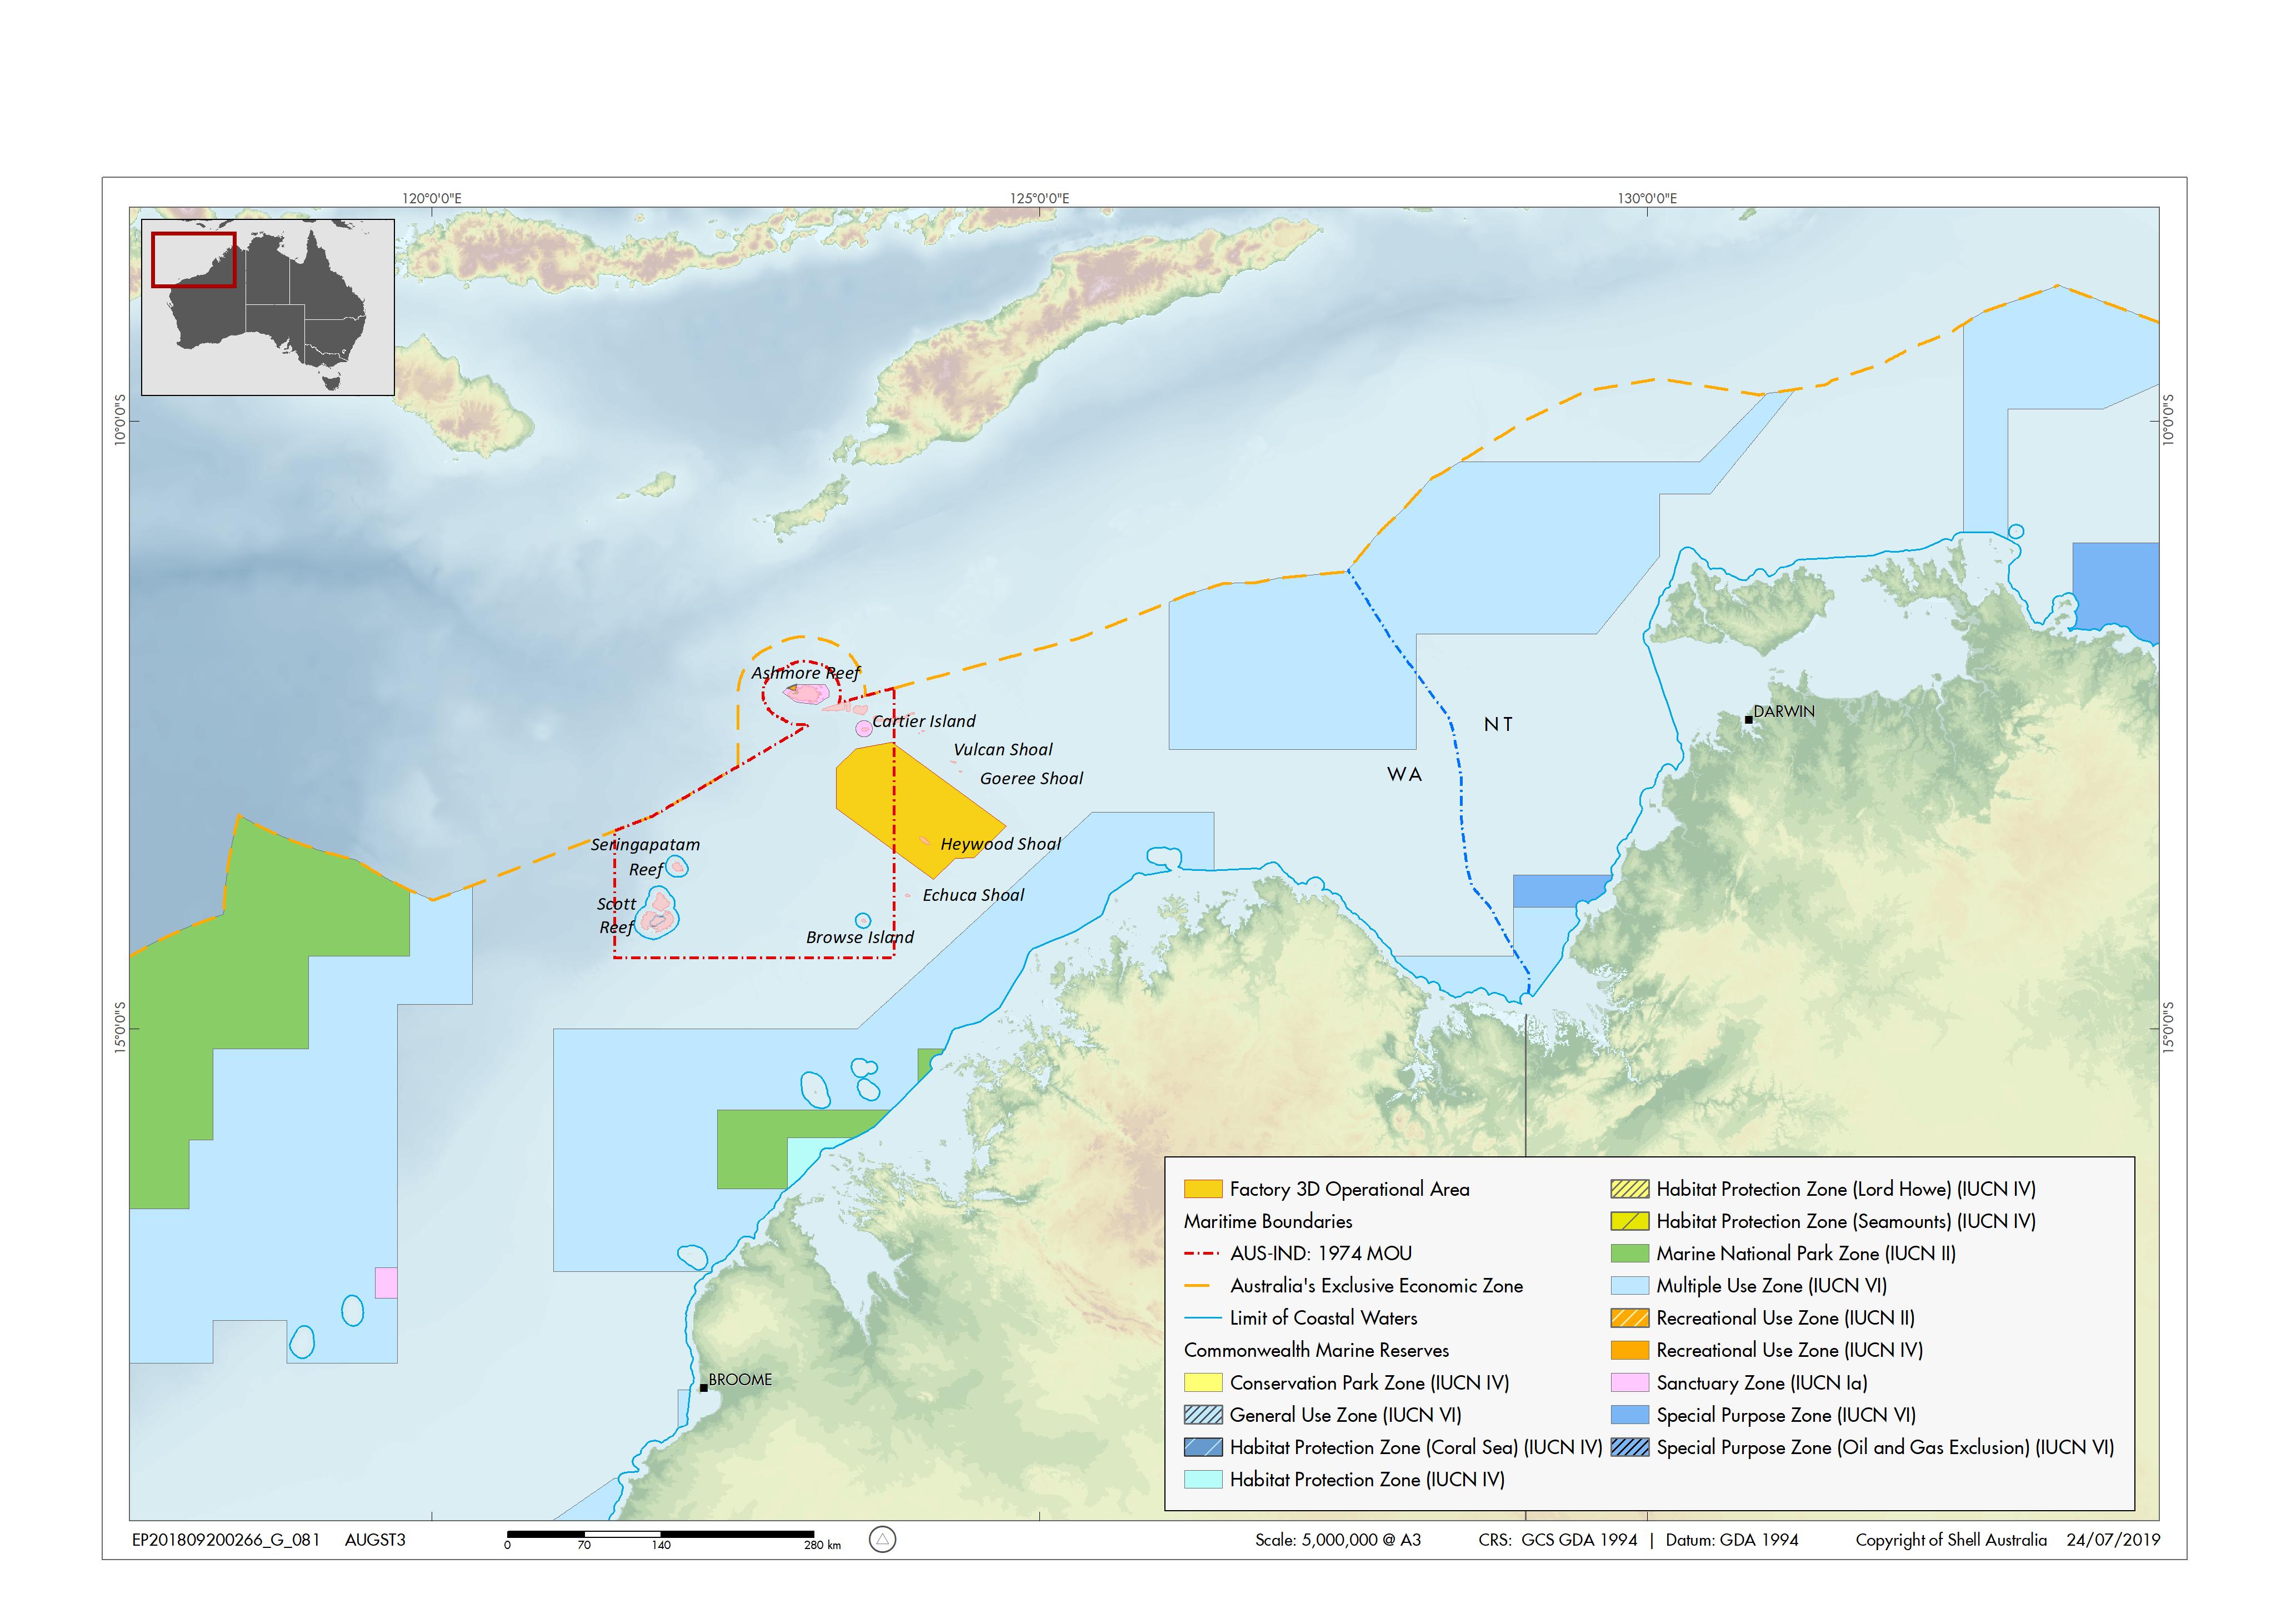 Location map - Activity: Factory 3D Marine Seismic Survey (refer to description)